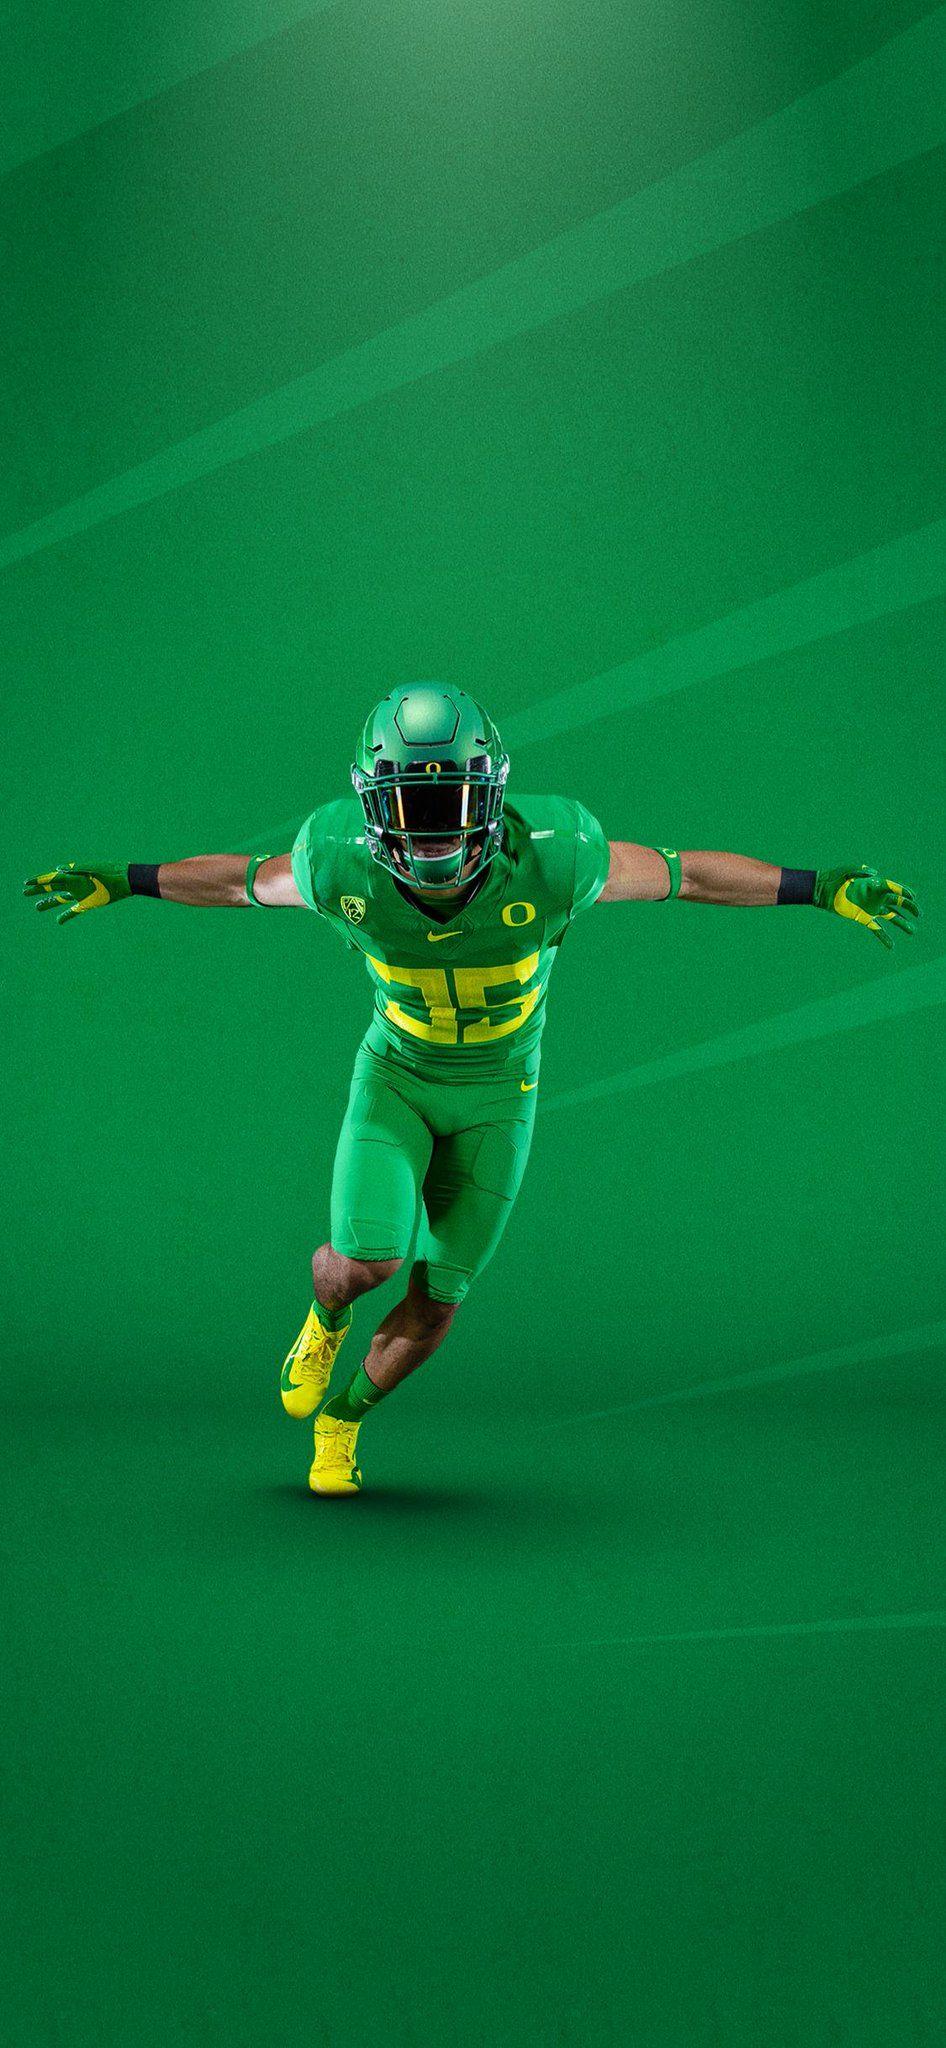 2019 University Of Oregon Ducks Football Uniforms All Green Oregon Ducks Football Oregon Football Football Wallpaper